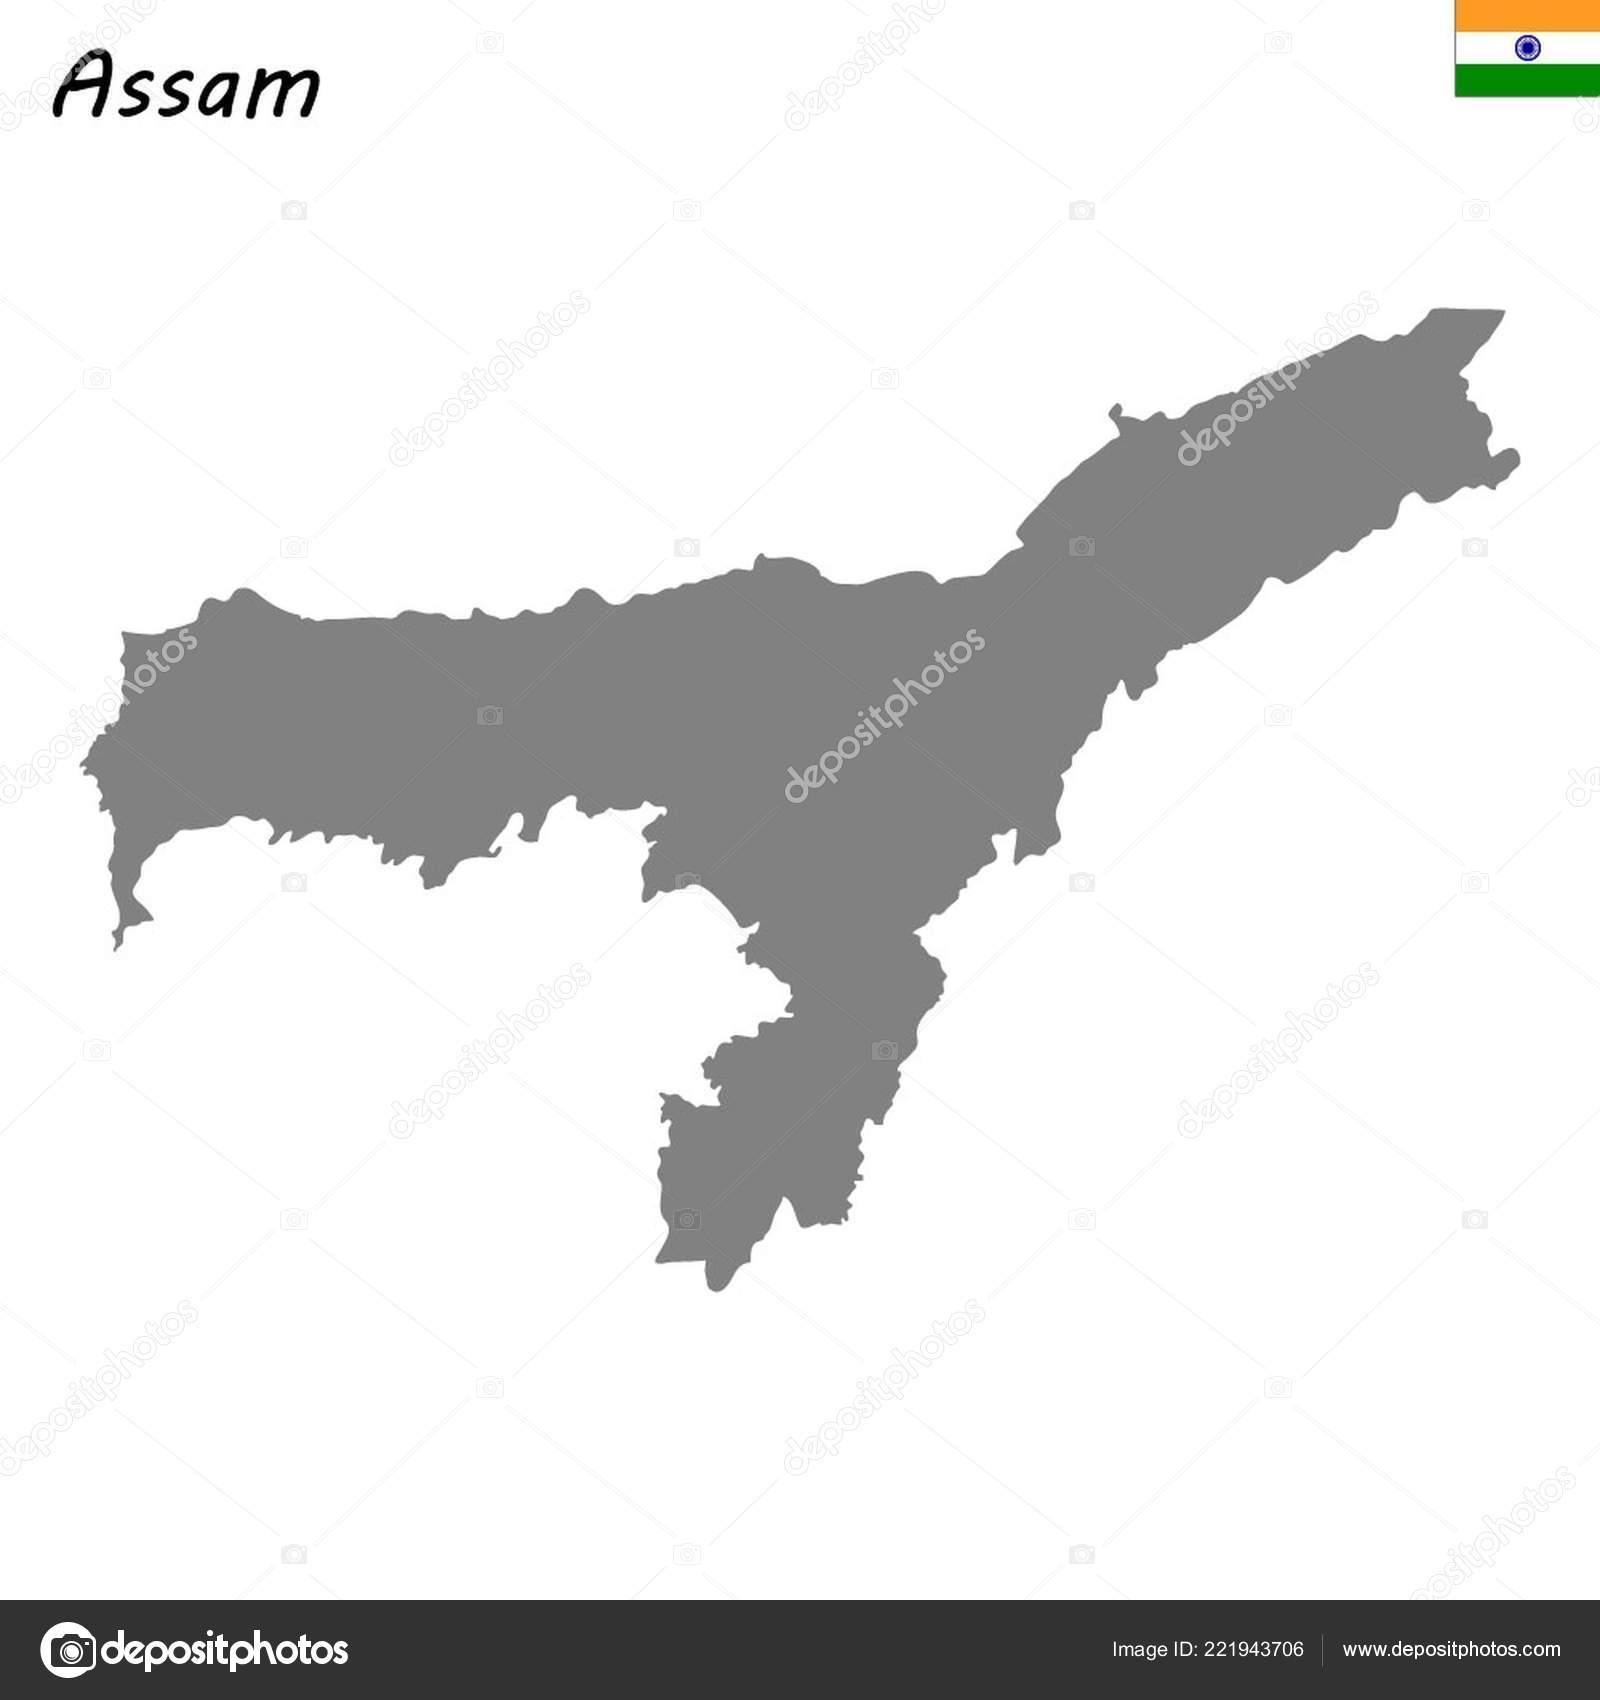 High Quality Map Assam State India Stock Vector C Grebeshkovmaxim